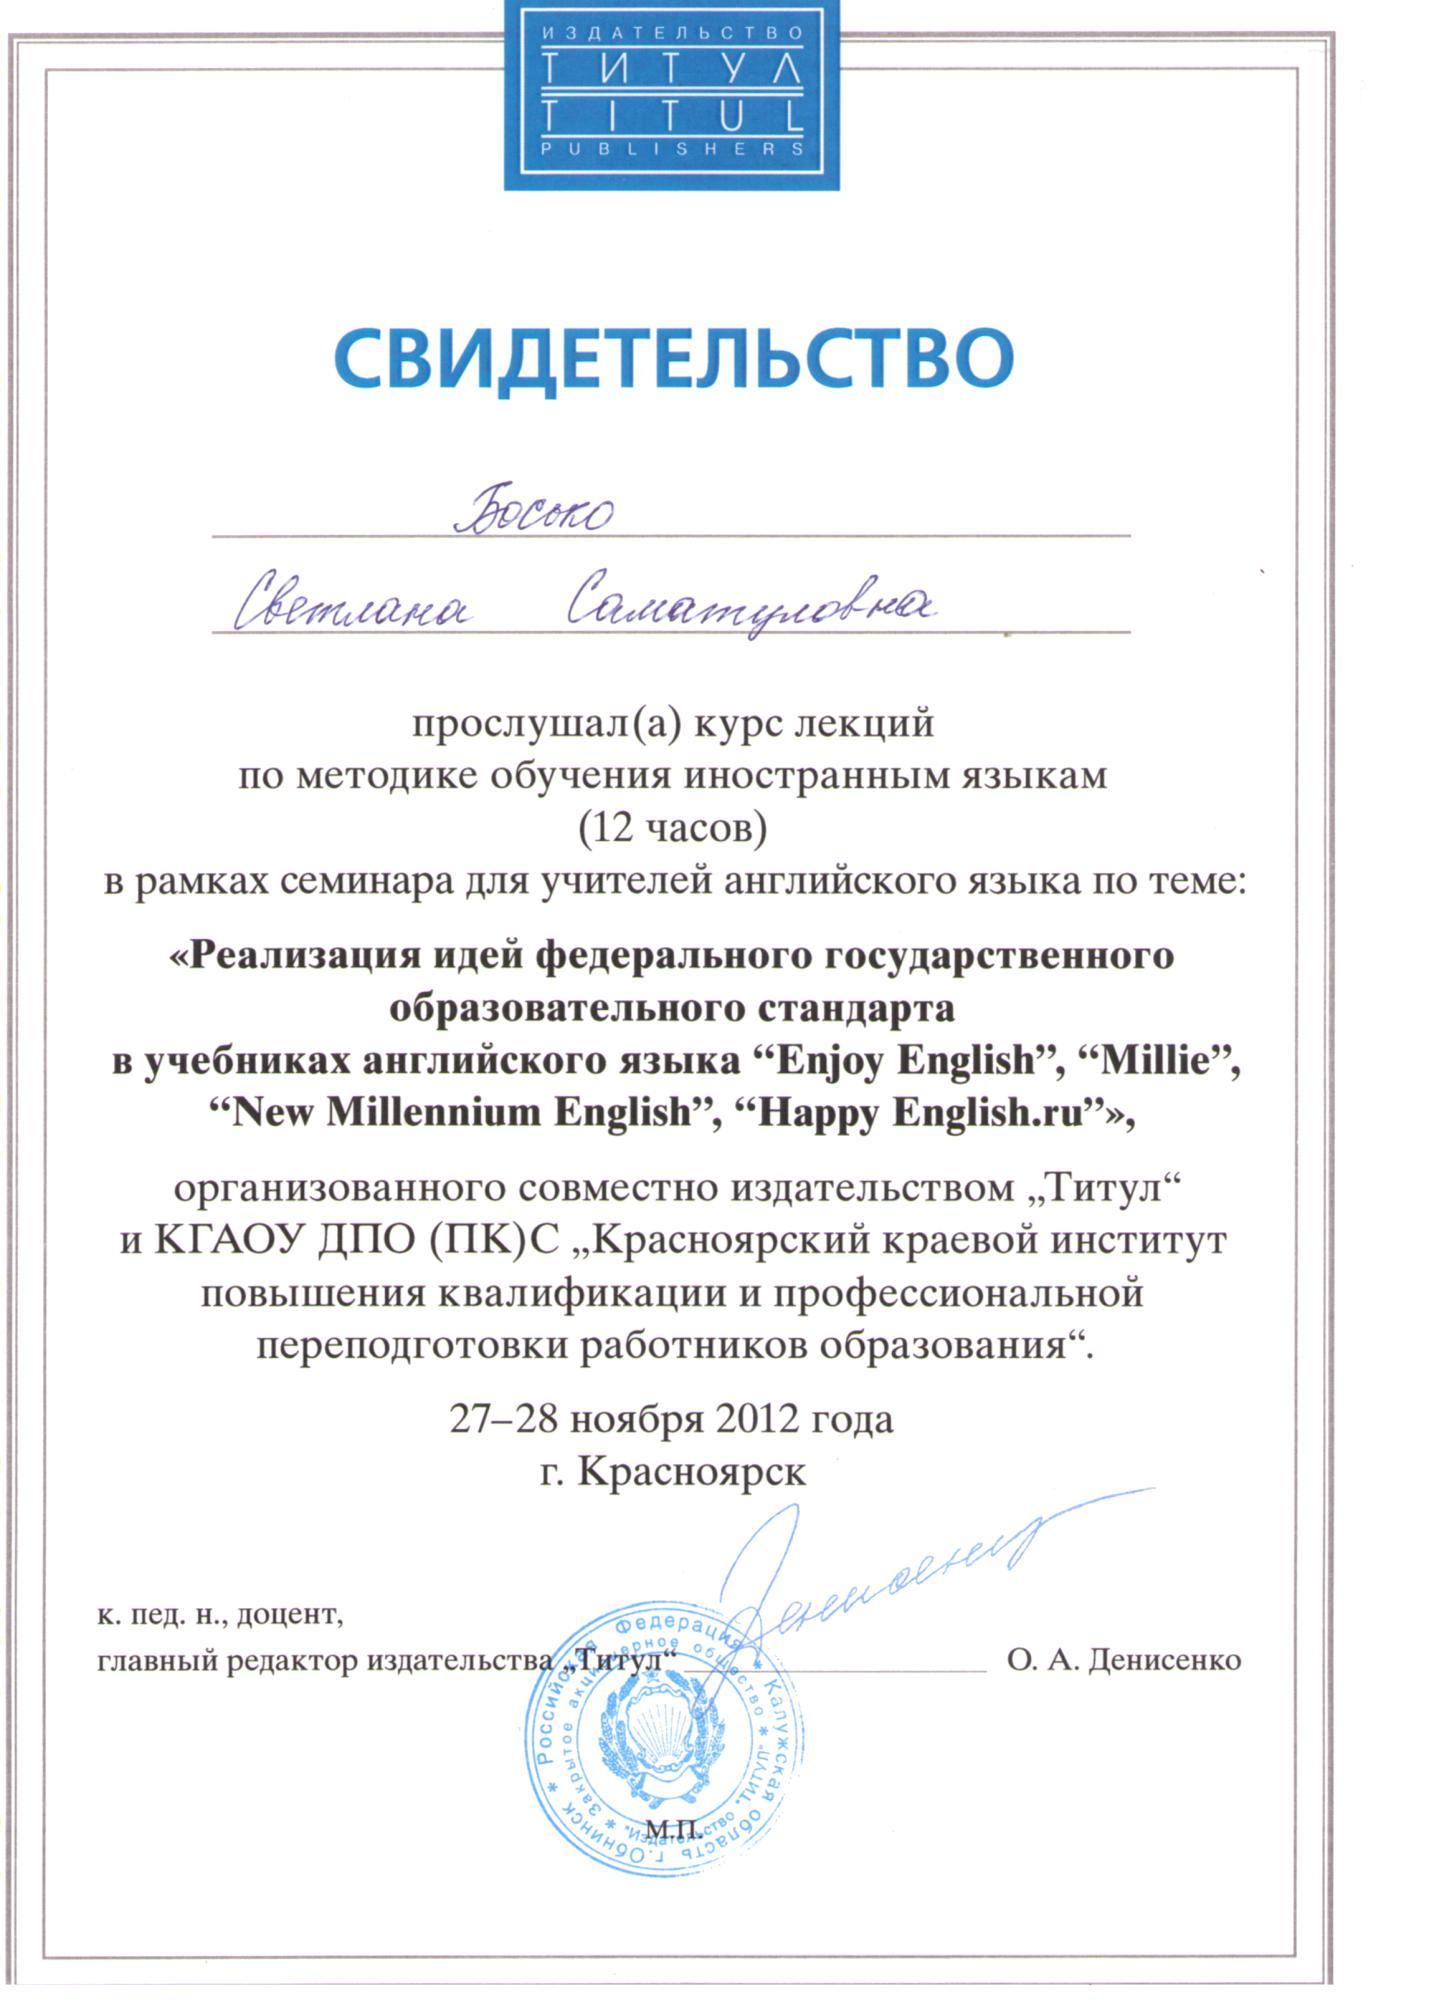 C:\Documents and Settings\Светлана Саматуловна\Рабочий стол\квалификация\12.tif